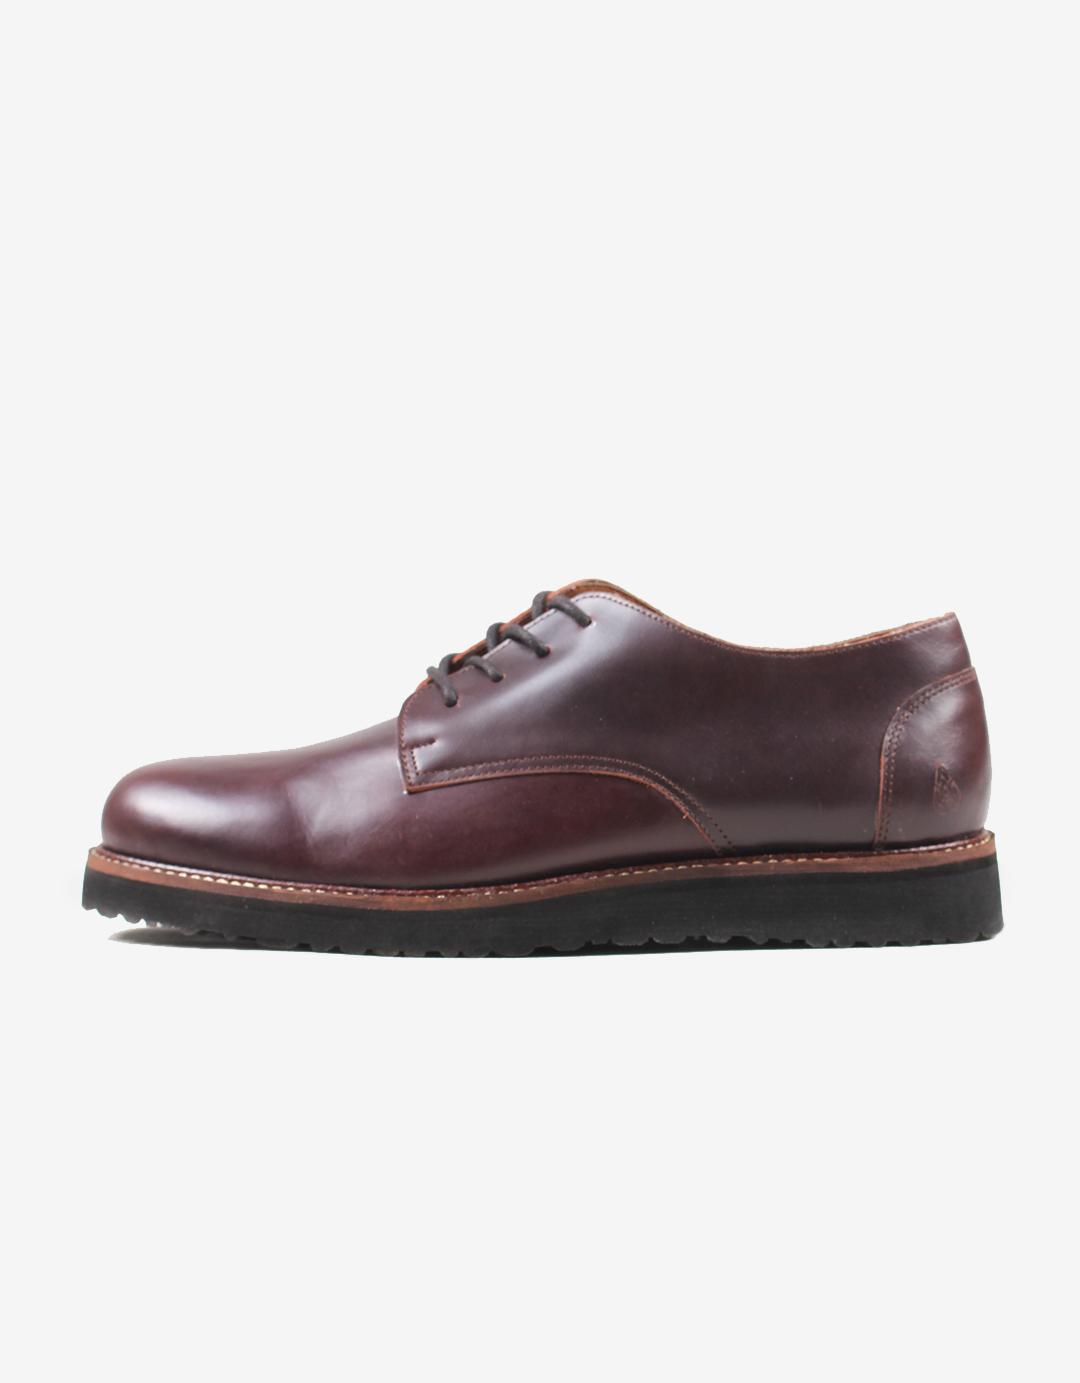 Dagangan Bandung Shop Line Sepatu Pria Kasual Sneaker Kulit Asli Casual Formal Maroon Brown Premium Airrabu Derby Wine